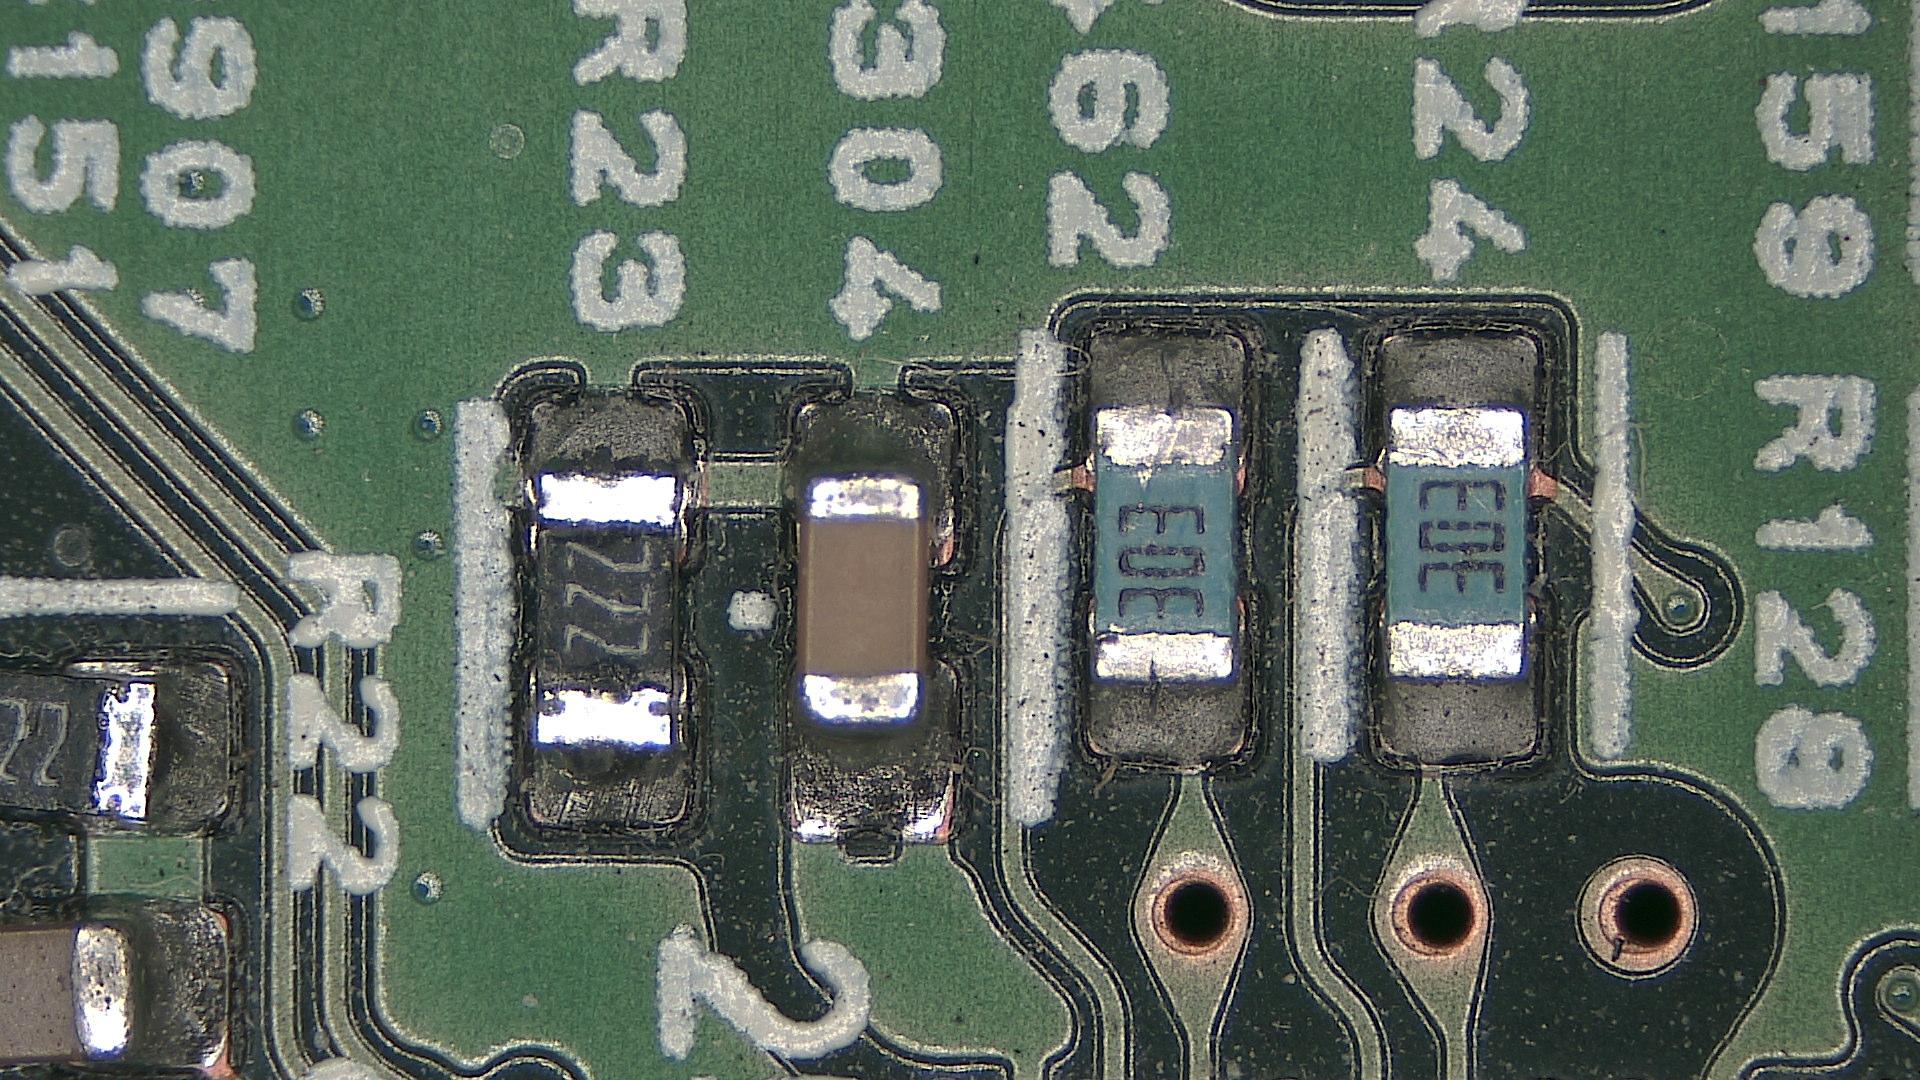 电路板 1920_1080